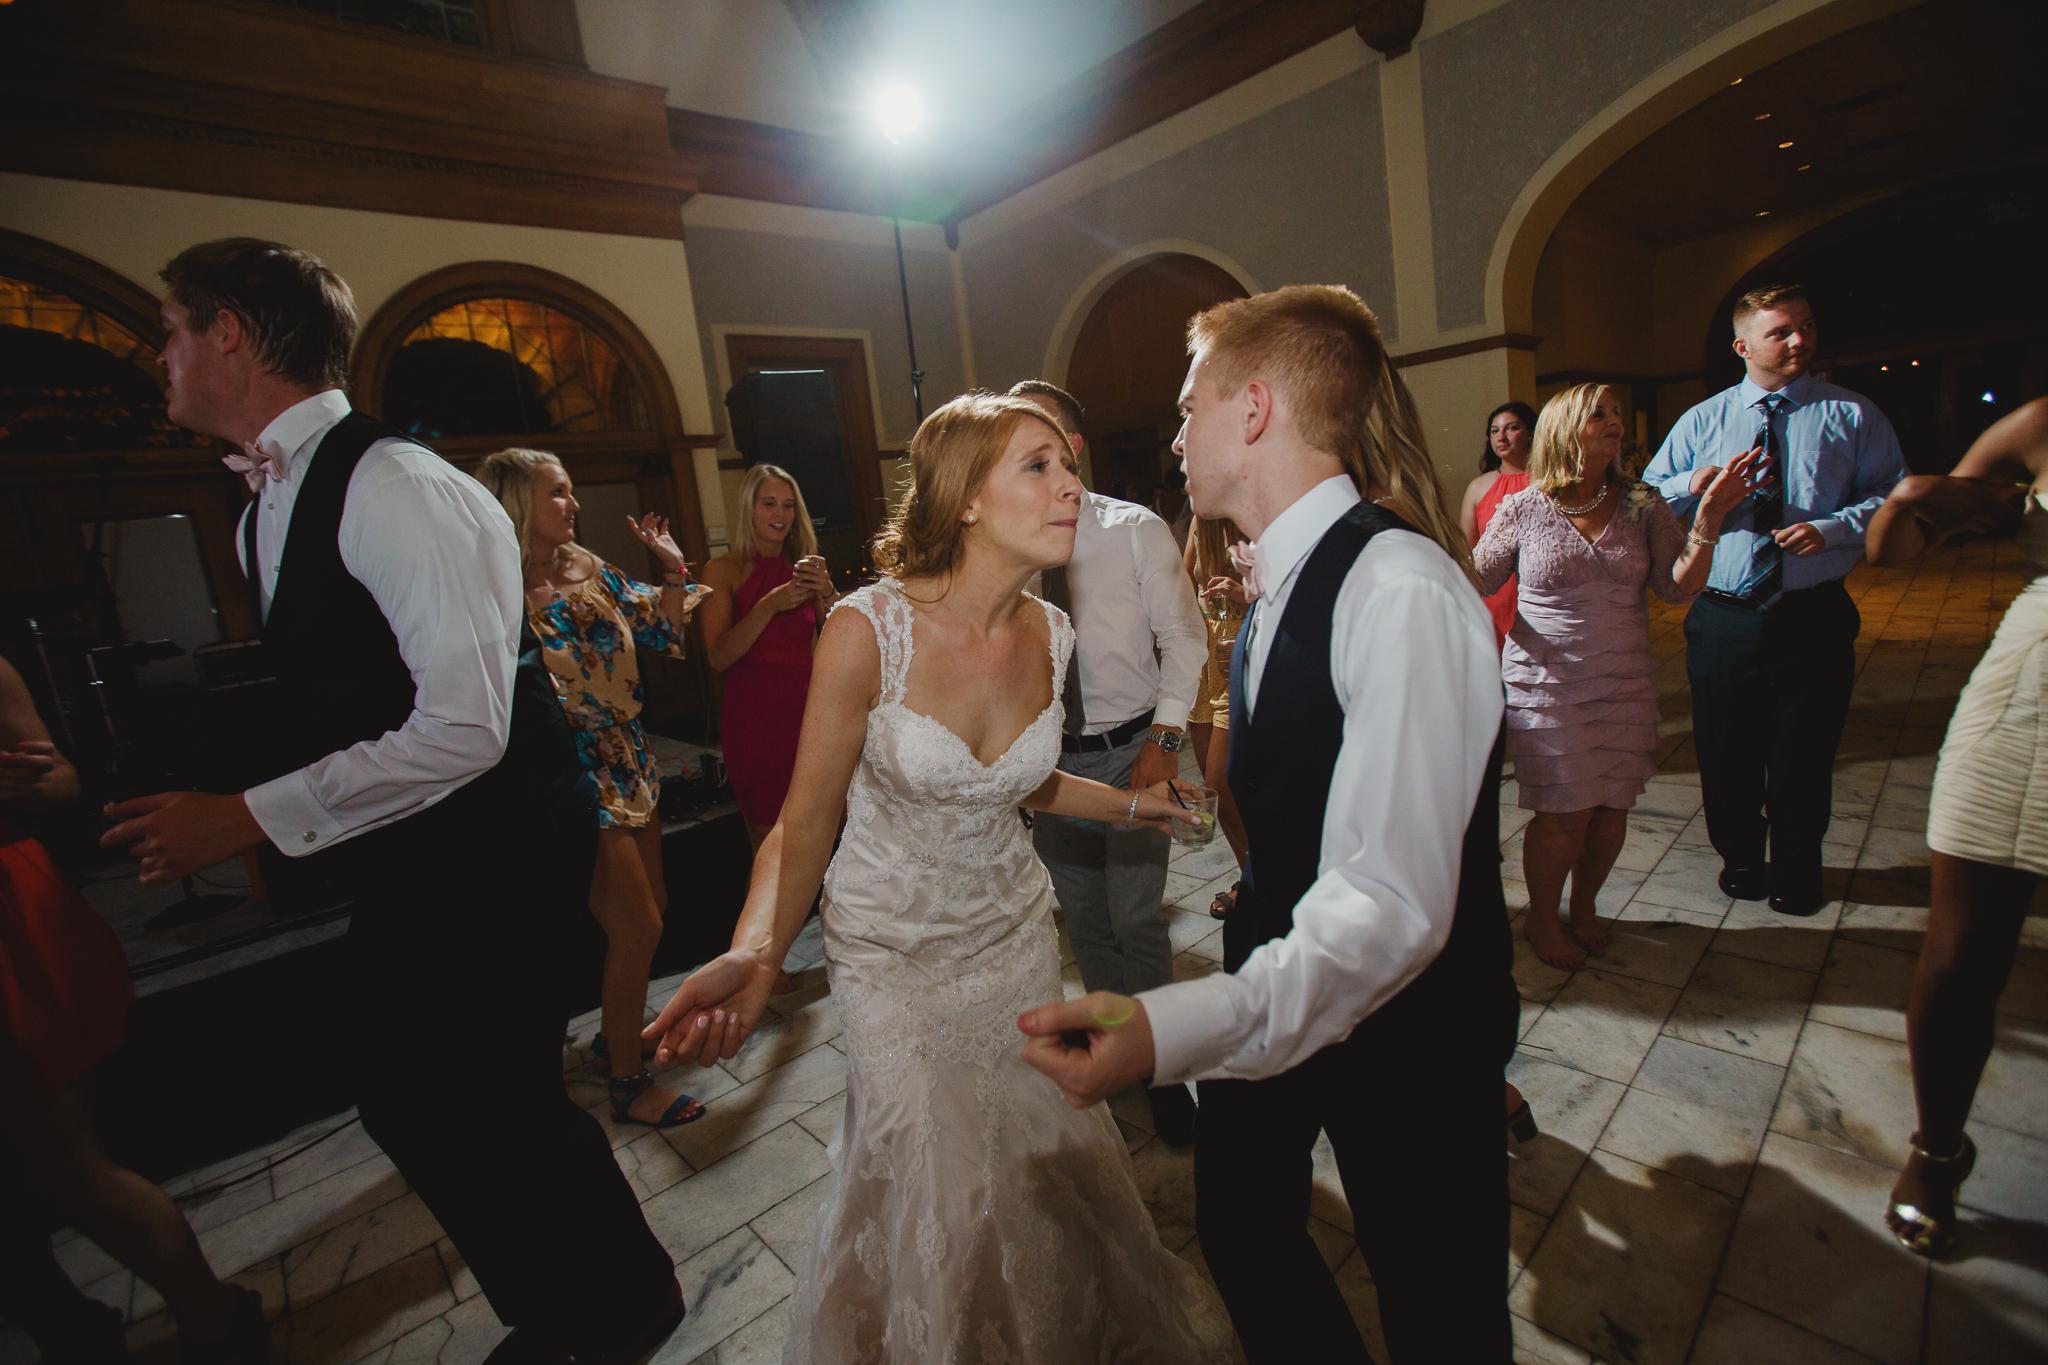 Michael and Kelly - the ashton depot - wedding DFW - wedding photographer- elizalde photography (139 of 150).jpg